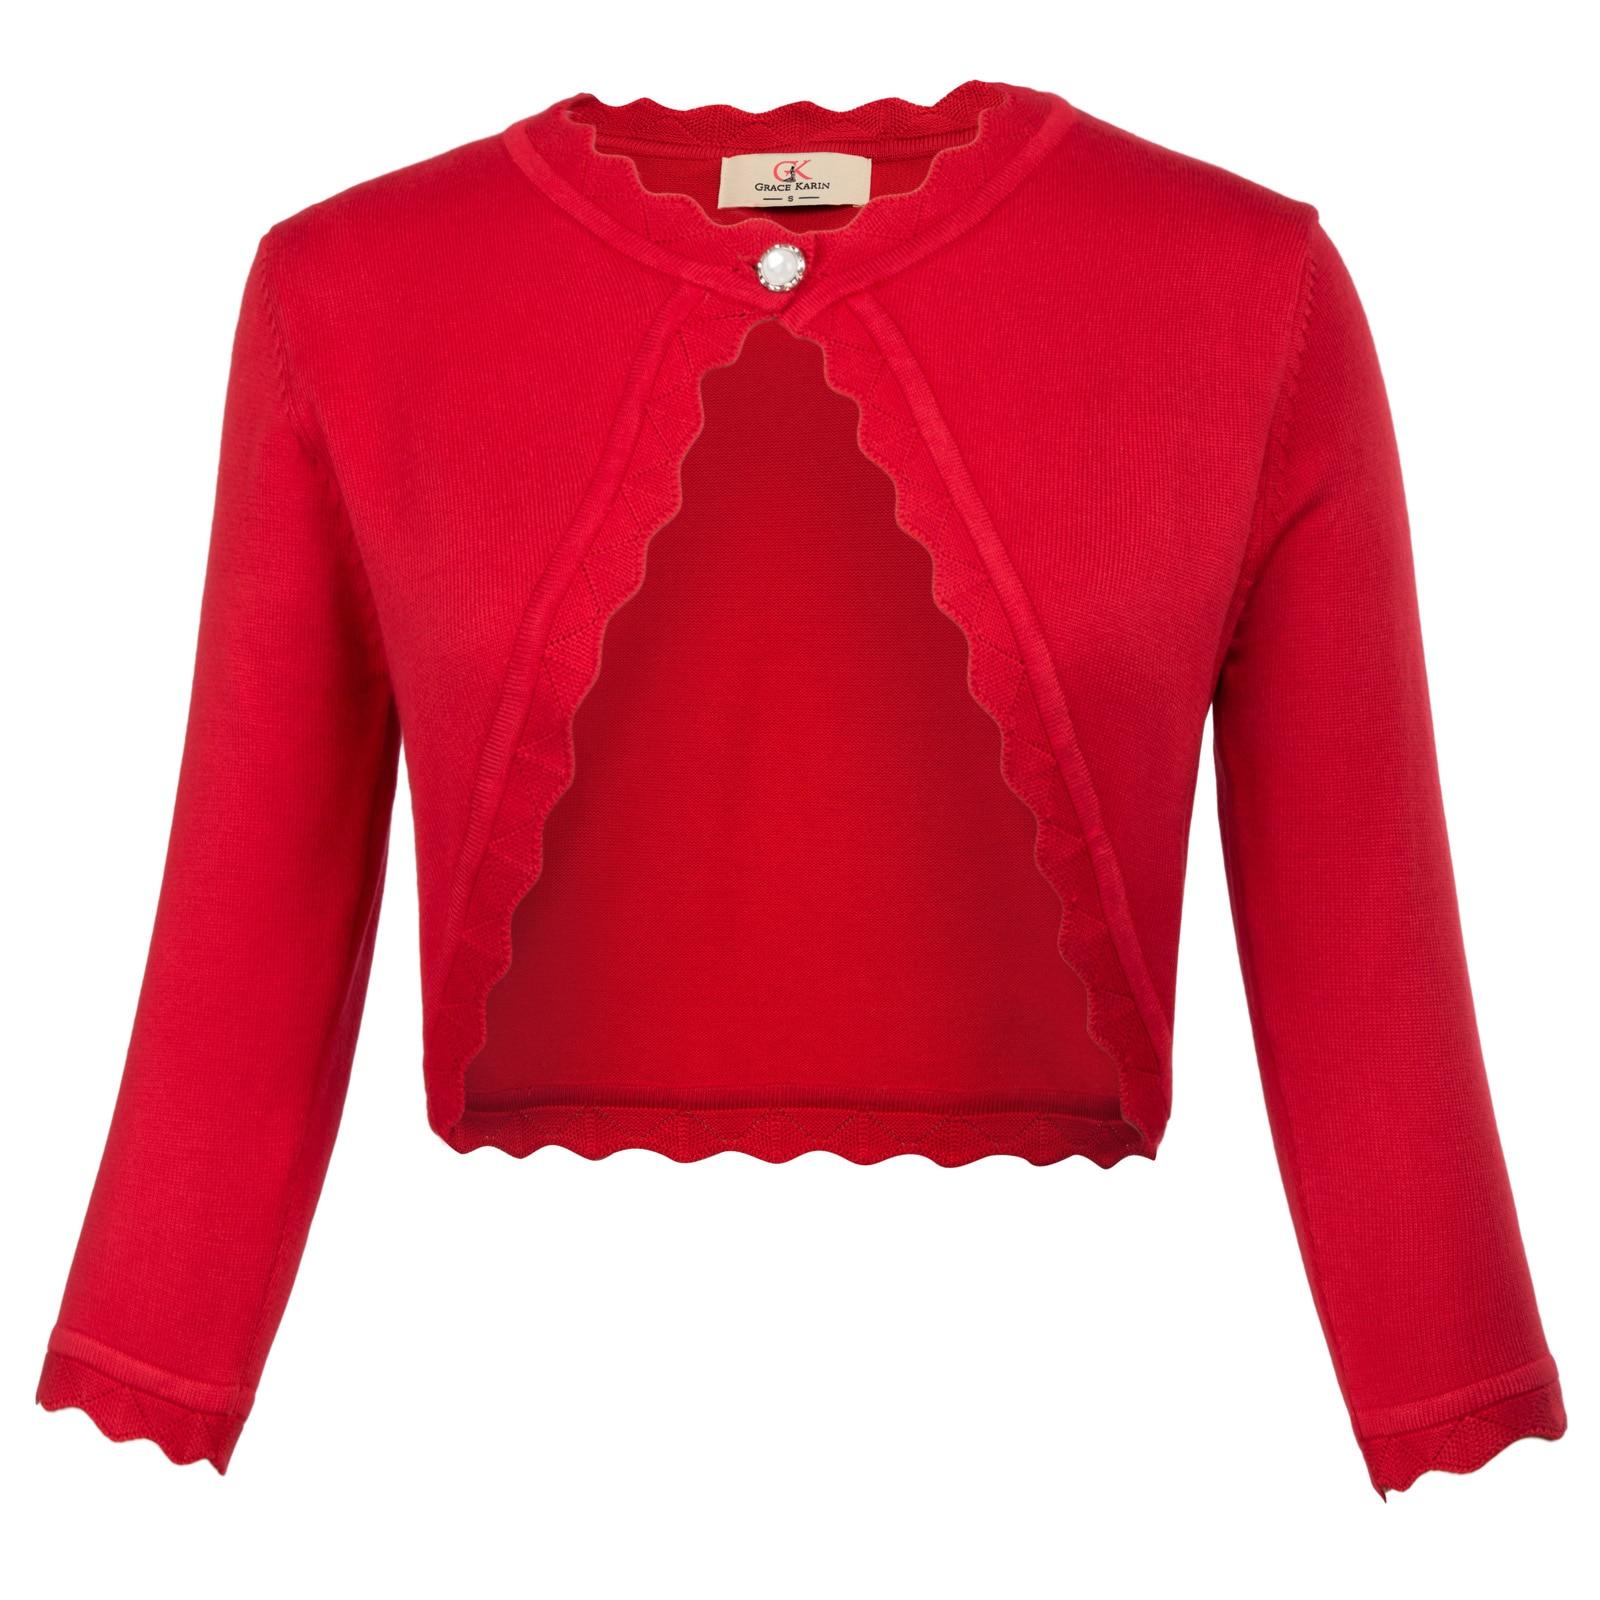 Women Knit Cardigan Sweater Shrug Crop Top Coat 3//4 Sleeve Button Down Sheer Red